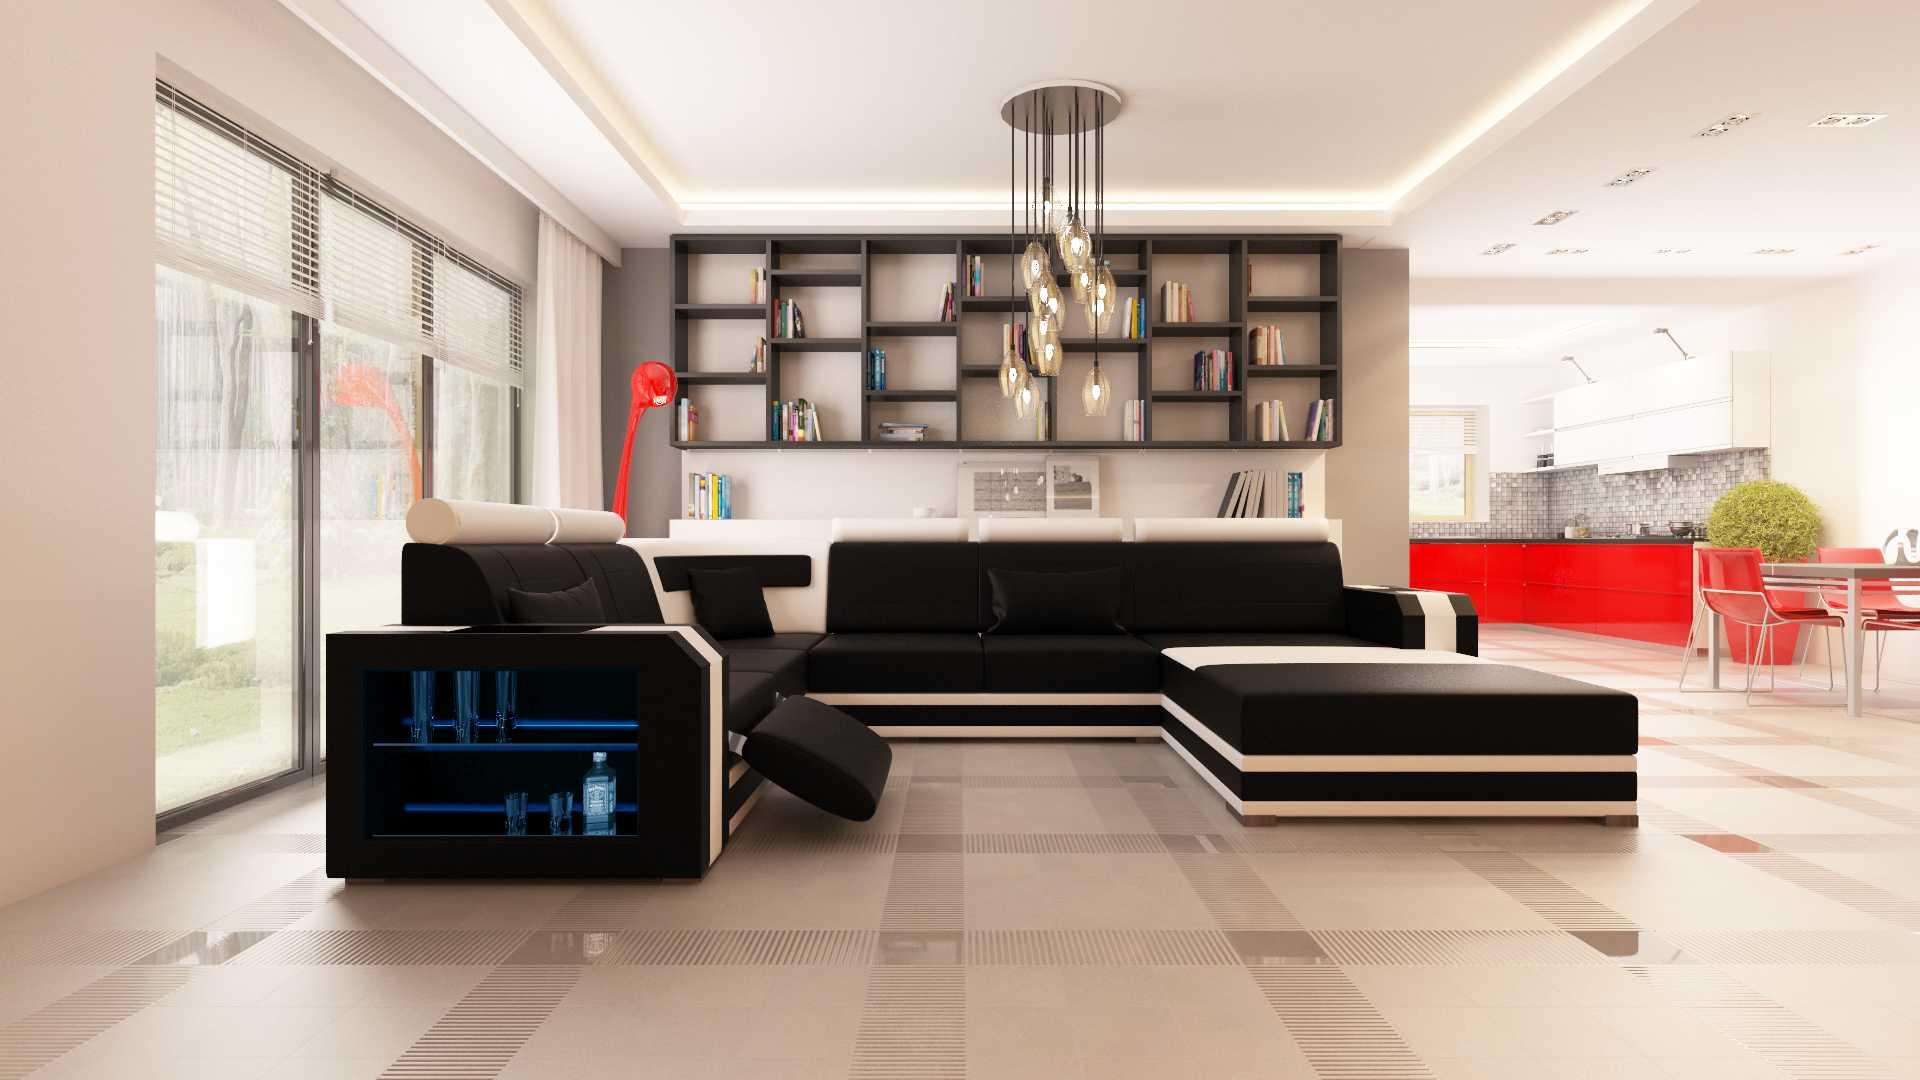 sofas und ledersofas konstanz ii bettfunktion designersofa. Black Bedroom Furniture Sets. Home Design Ideas